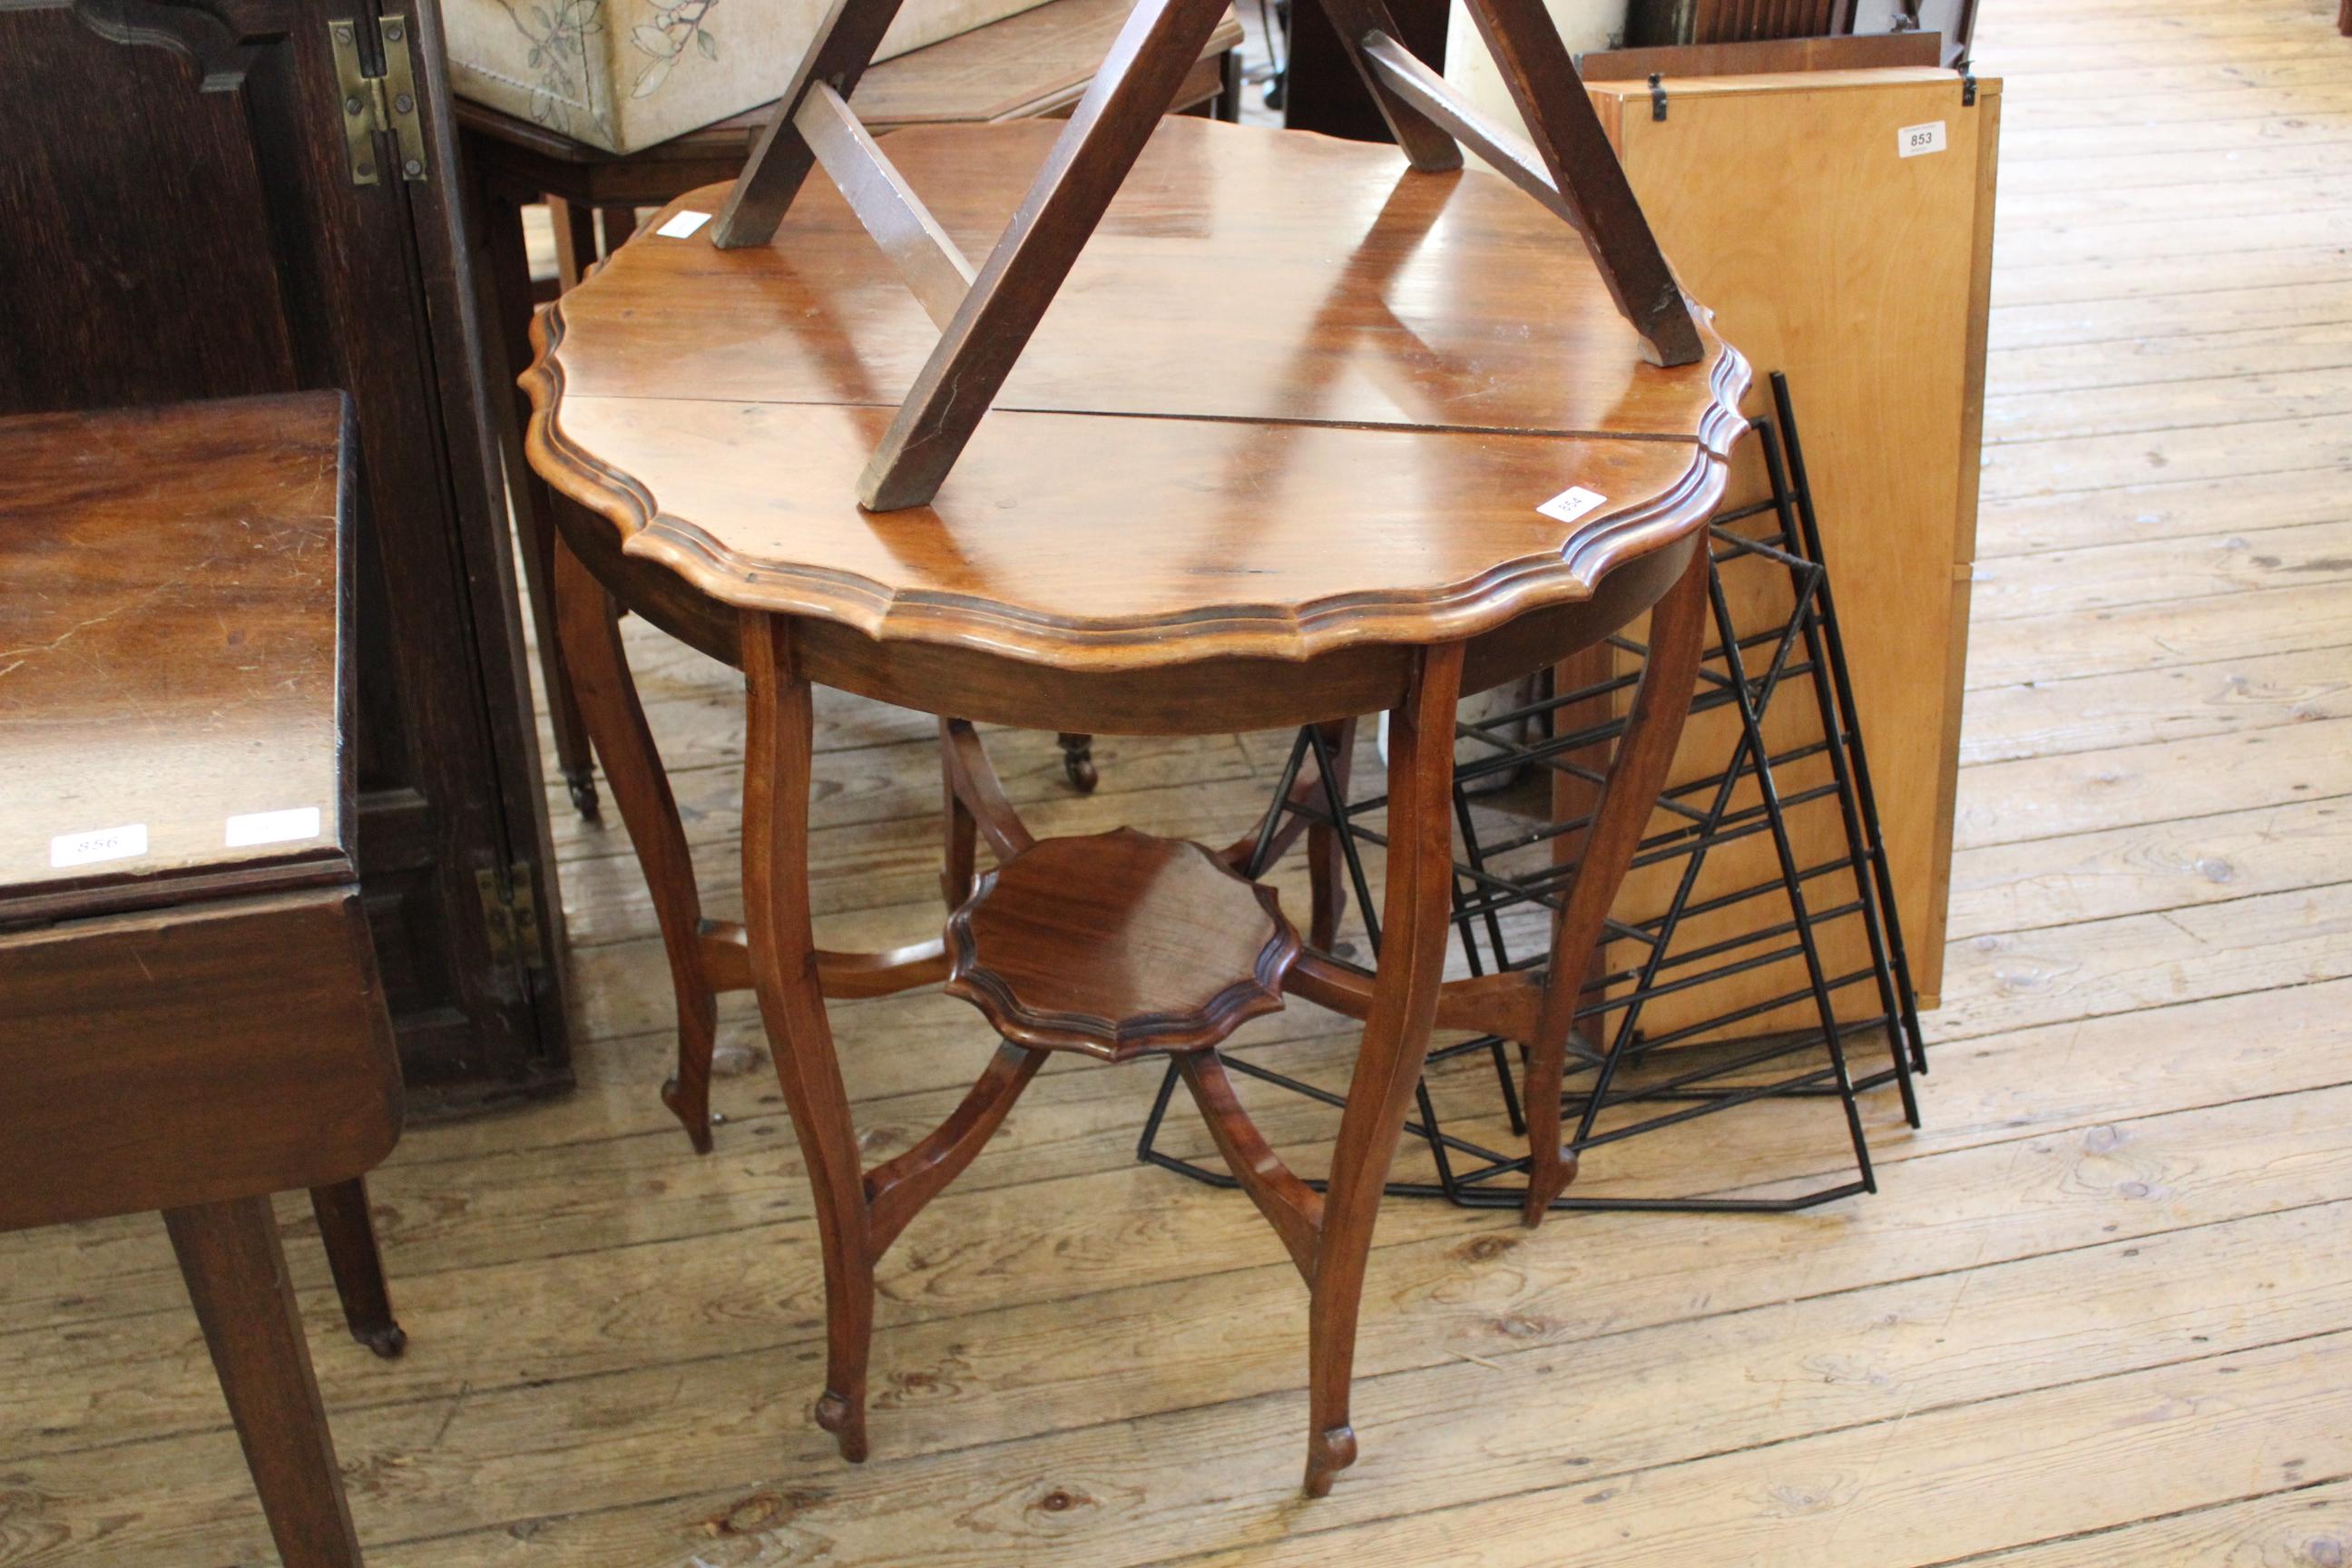 An Edwardian spider leg pie crust table